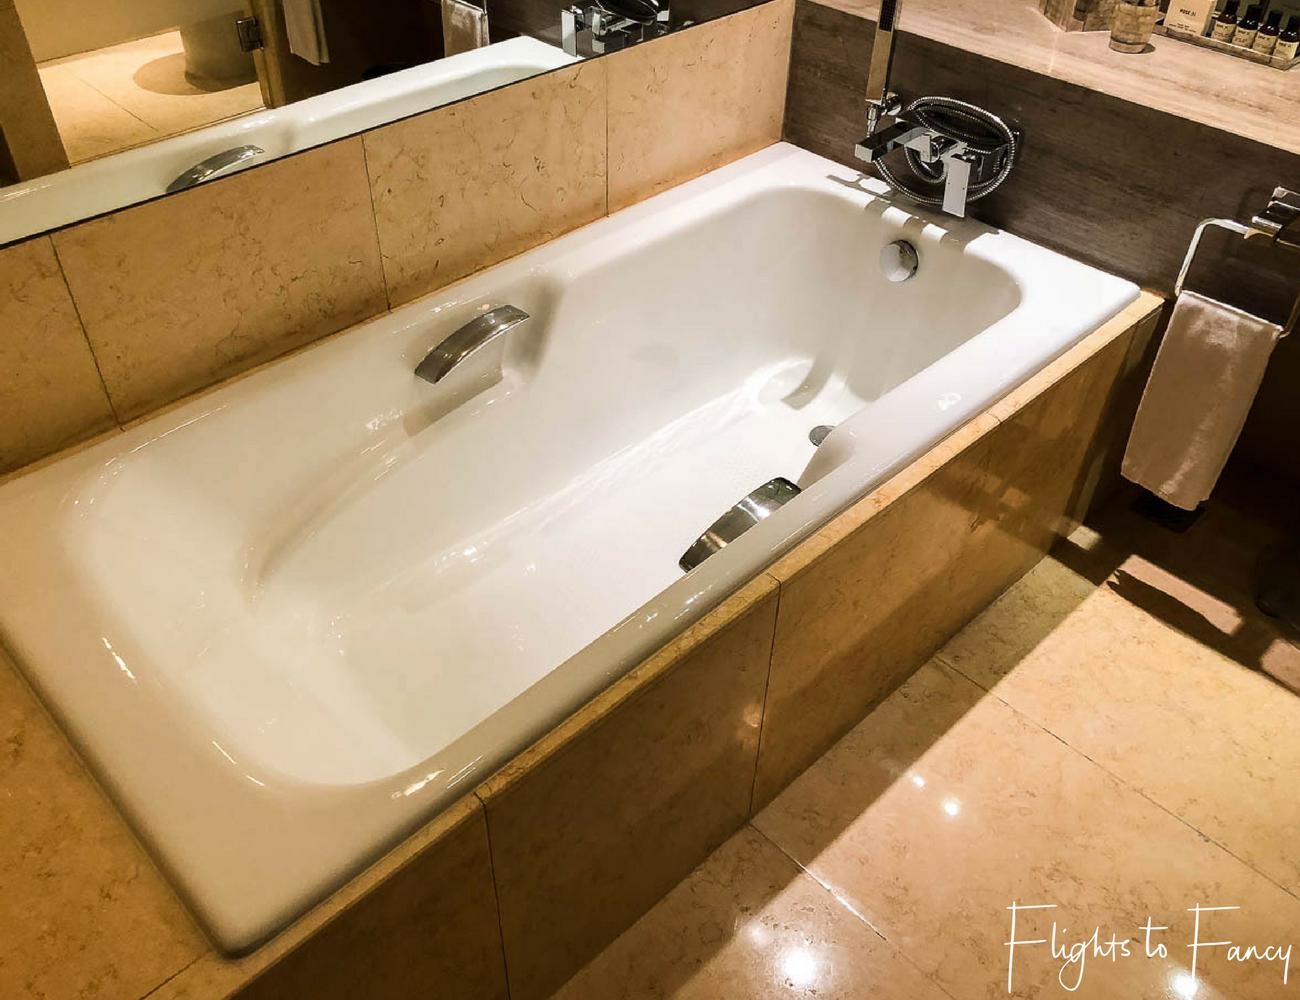 Flights to Fancy - Fairmont Makati Bathroom